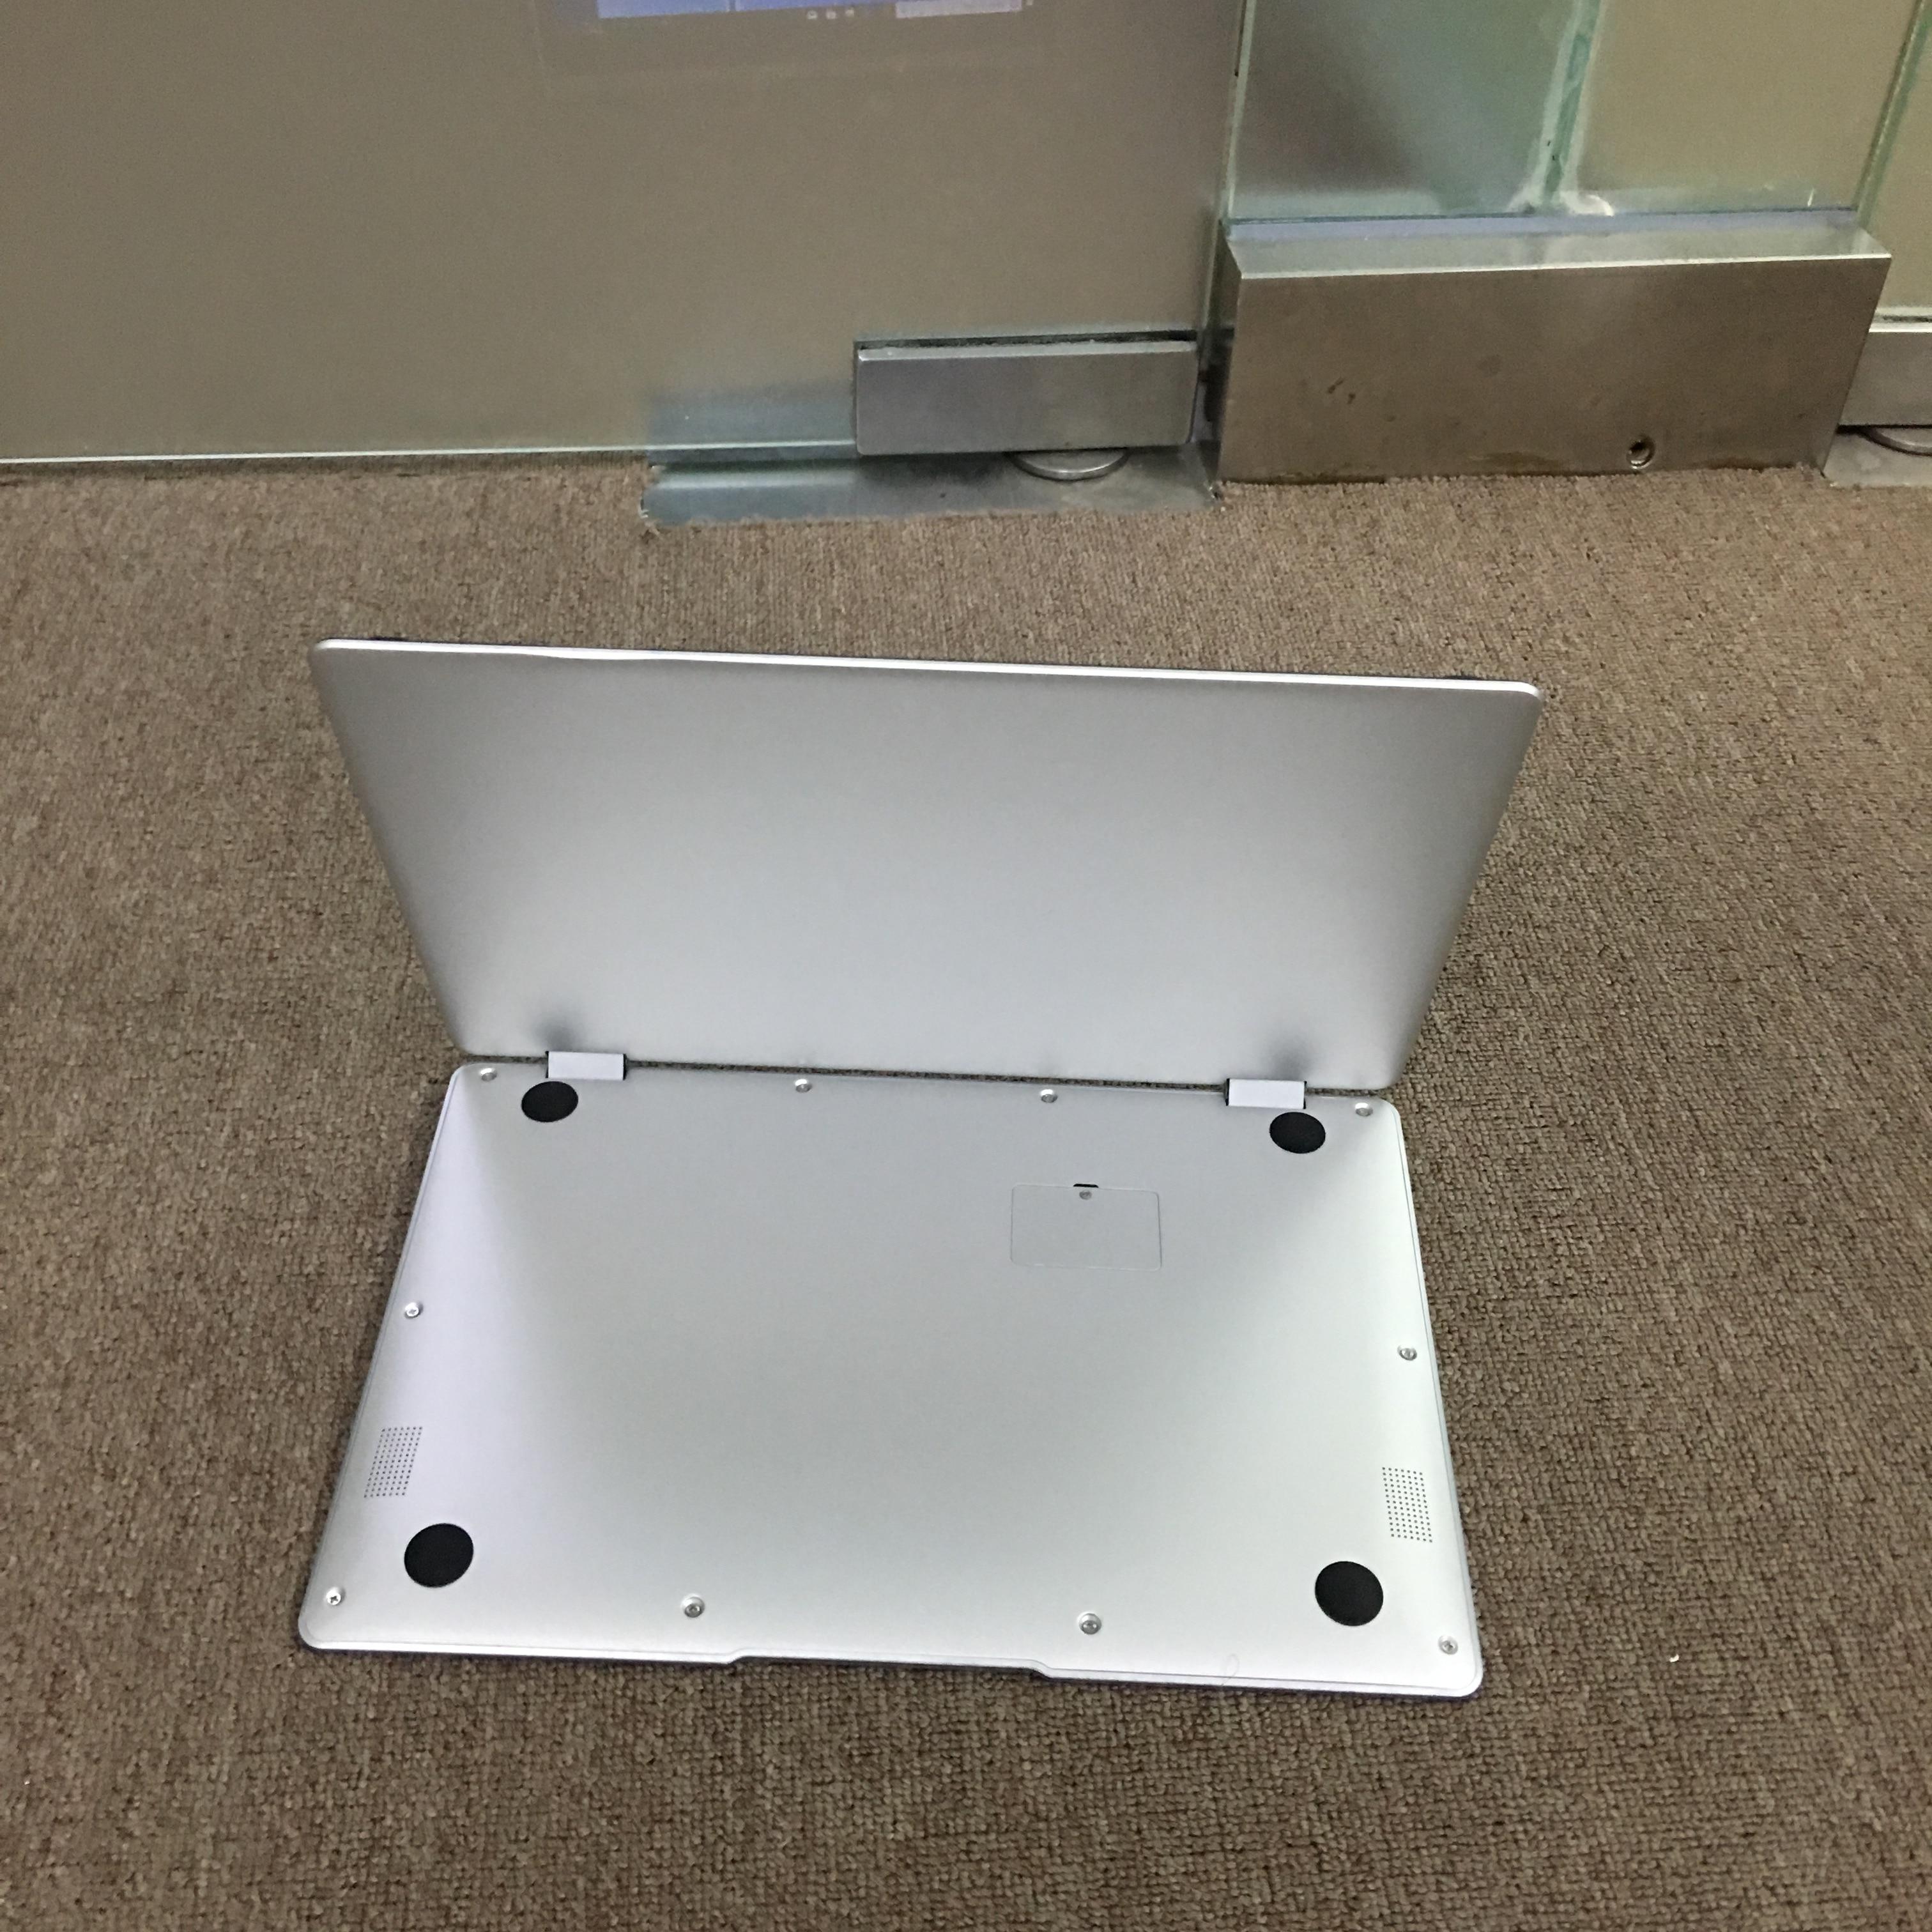 13.3 inch cheap price mini laptop with Win10 Intel Core i5 6200u 8gb ram 240gb SSD Mac Book Mini Laptop